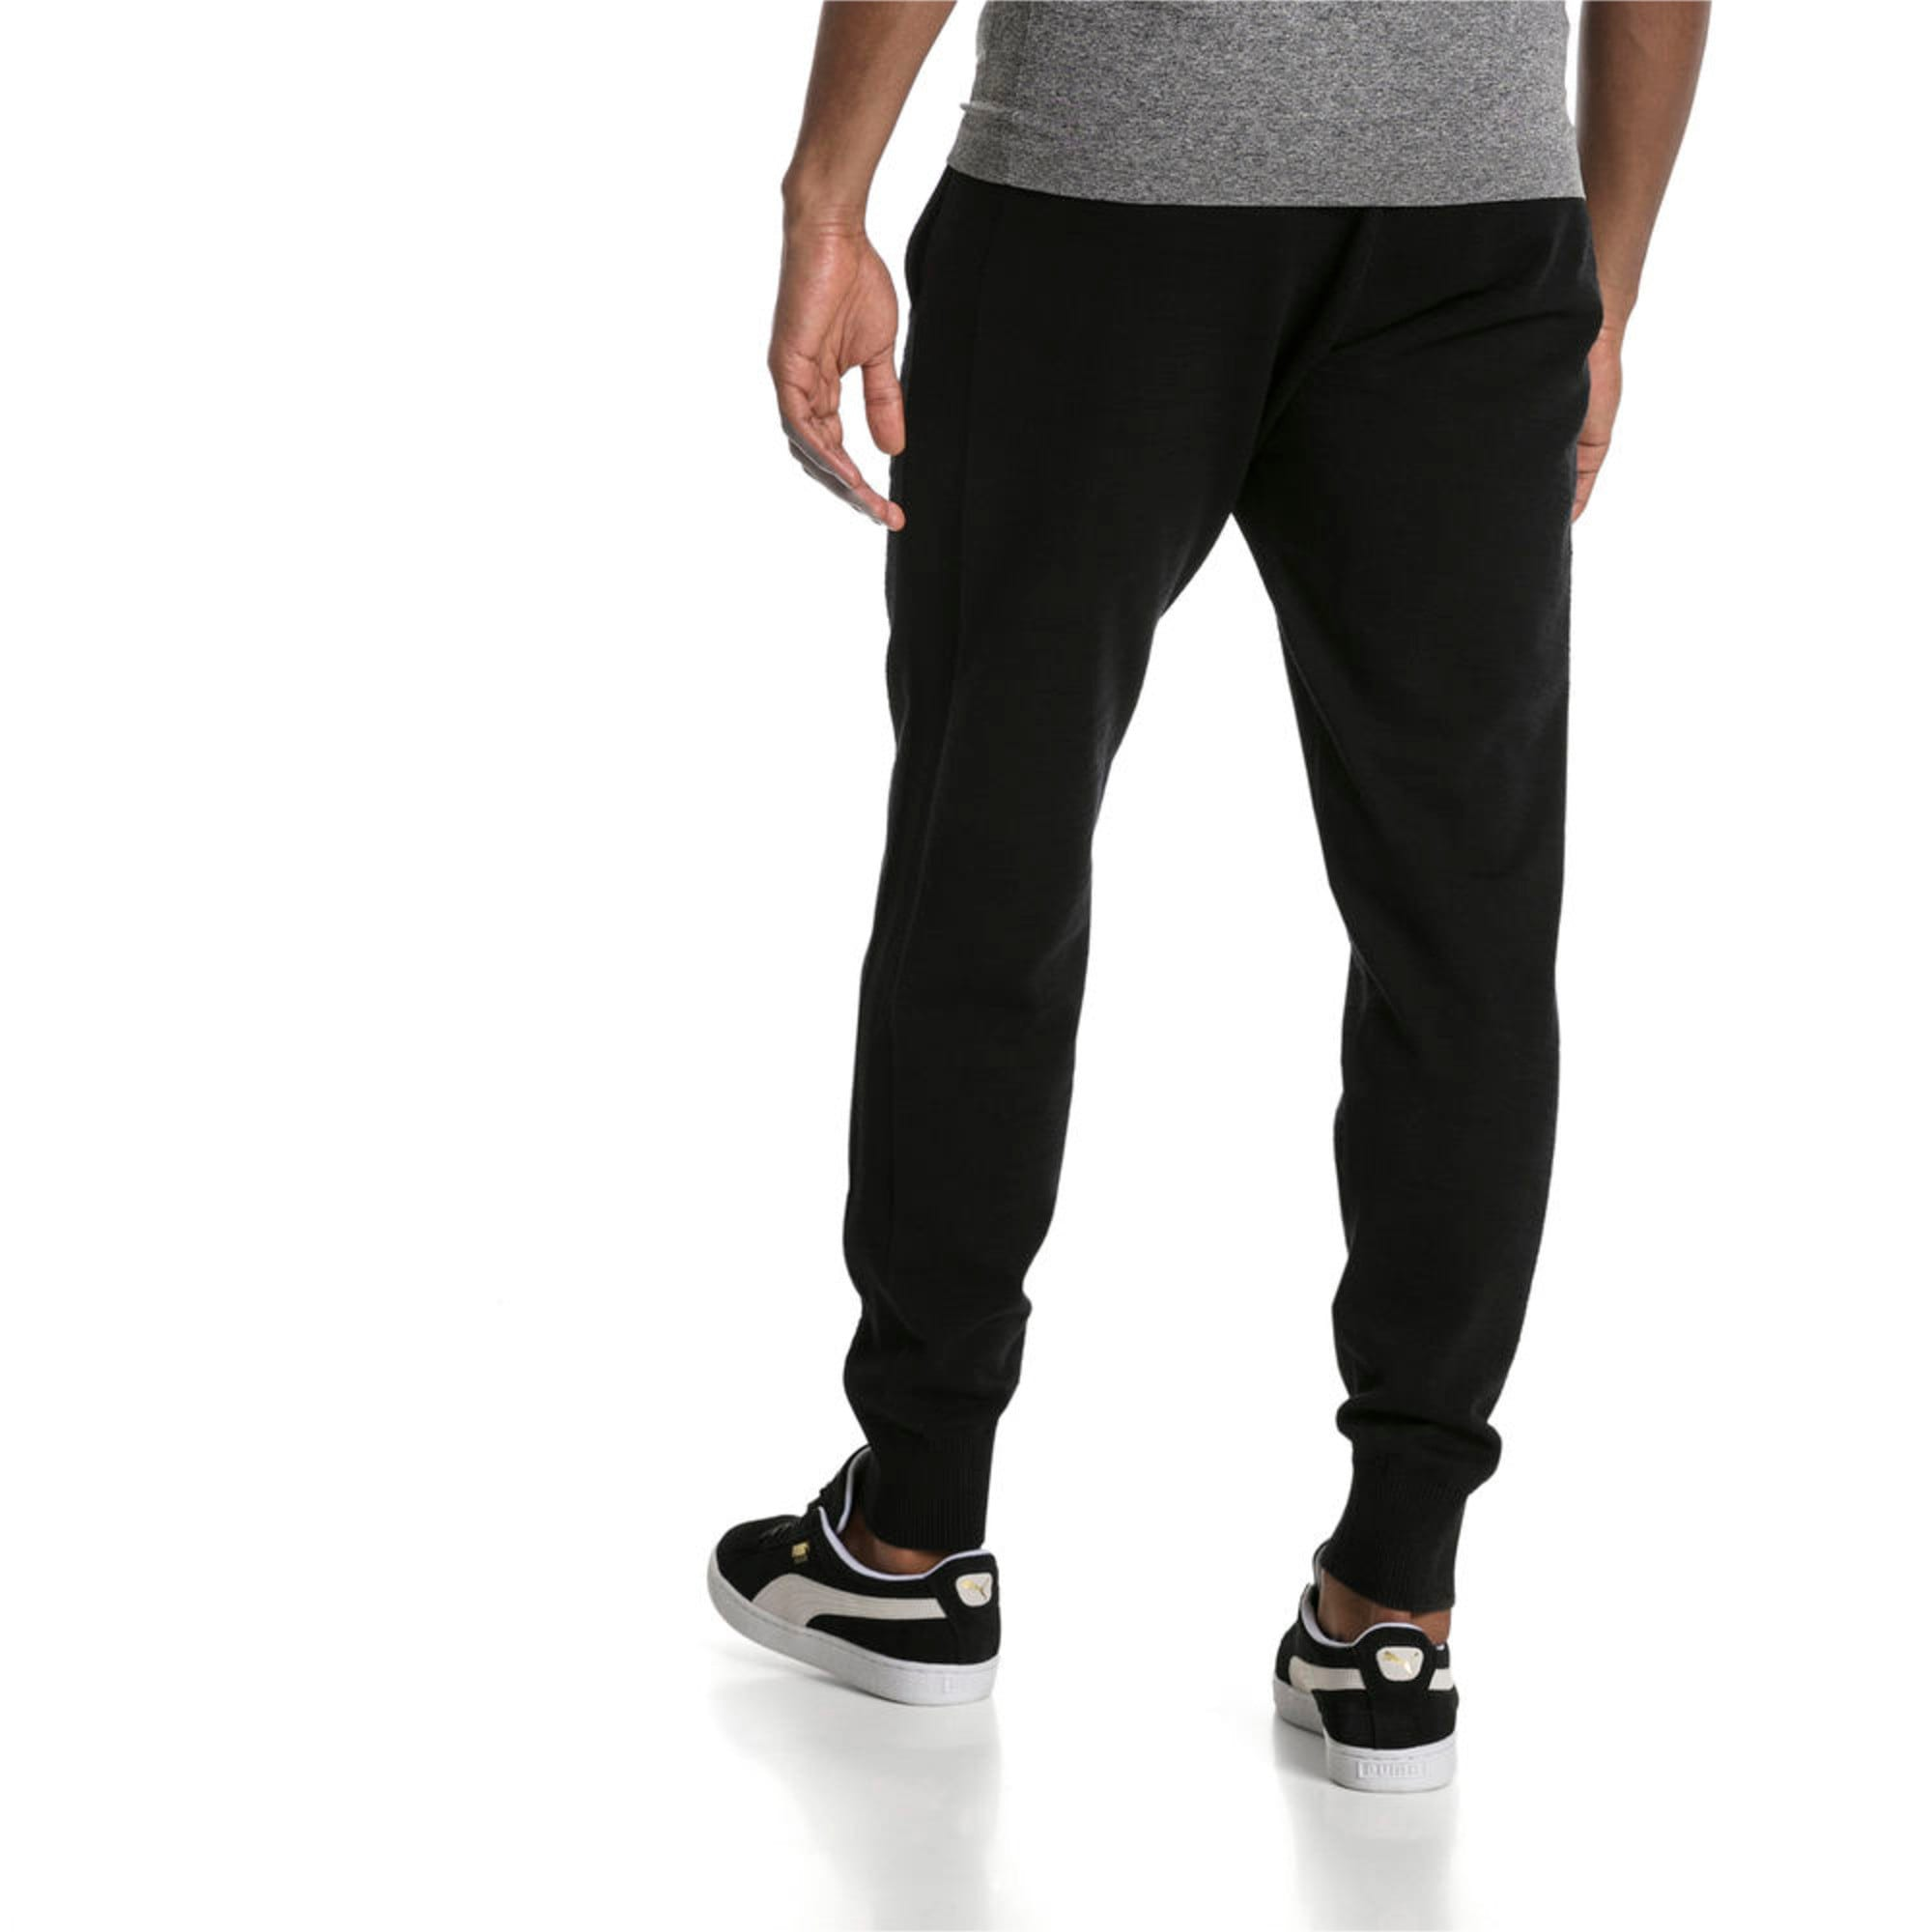 Thumbnail 2 of Men's T7 evoKnit Pants, Puma Black, medium-IND